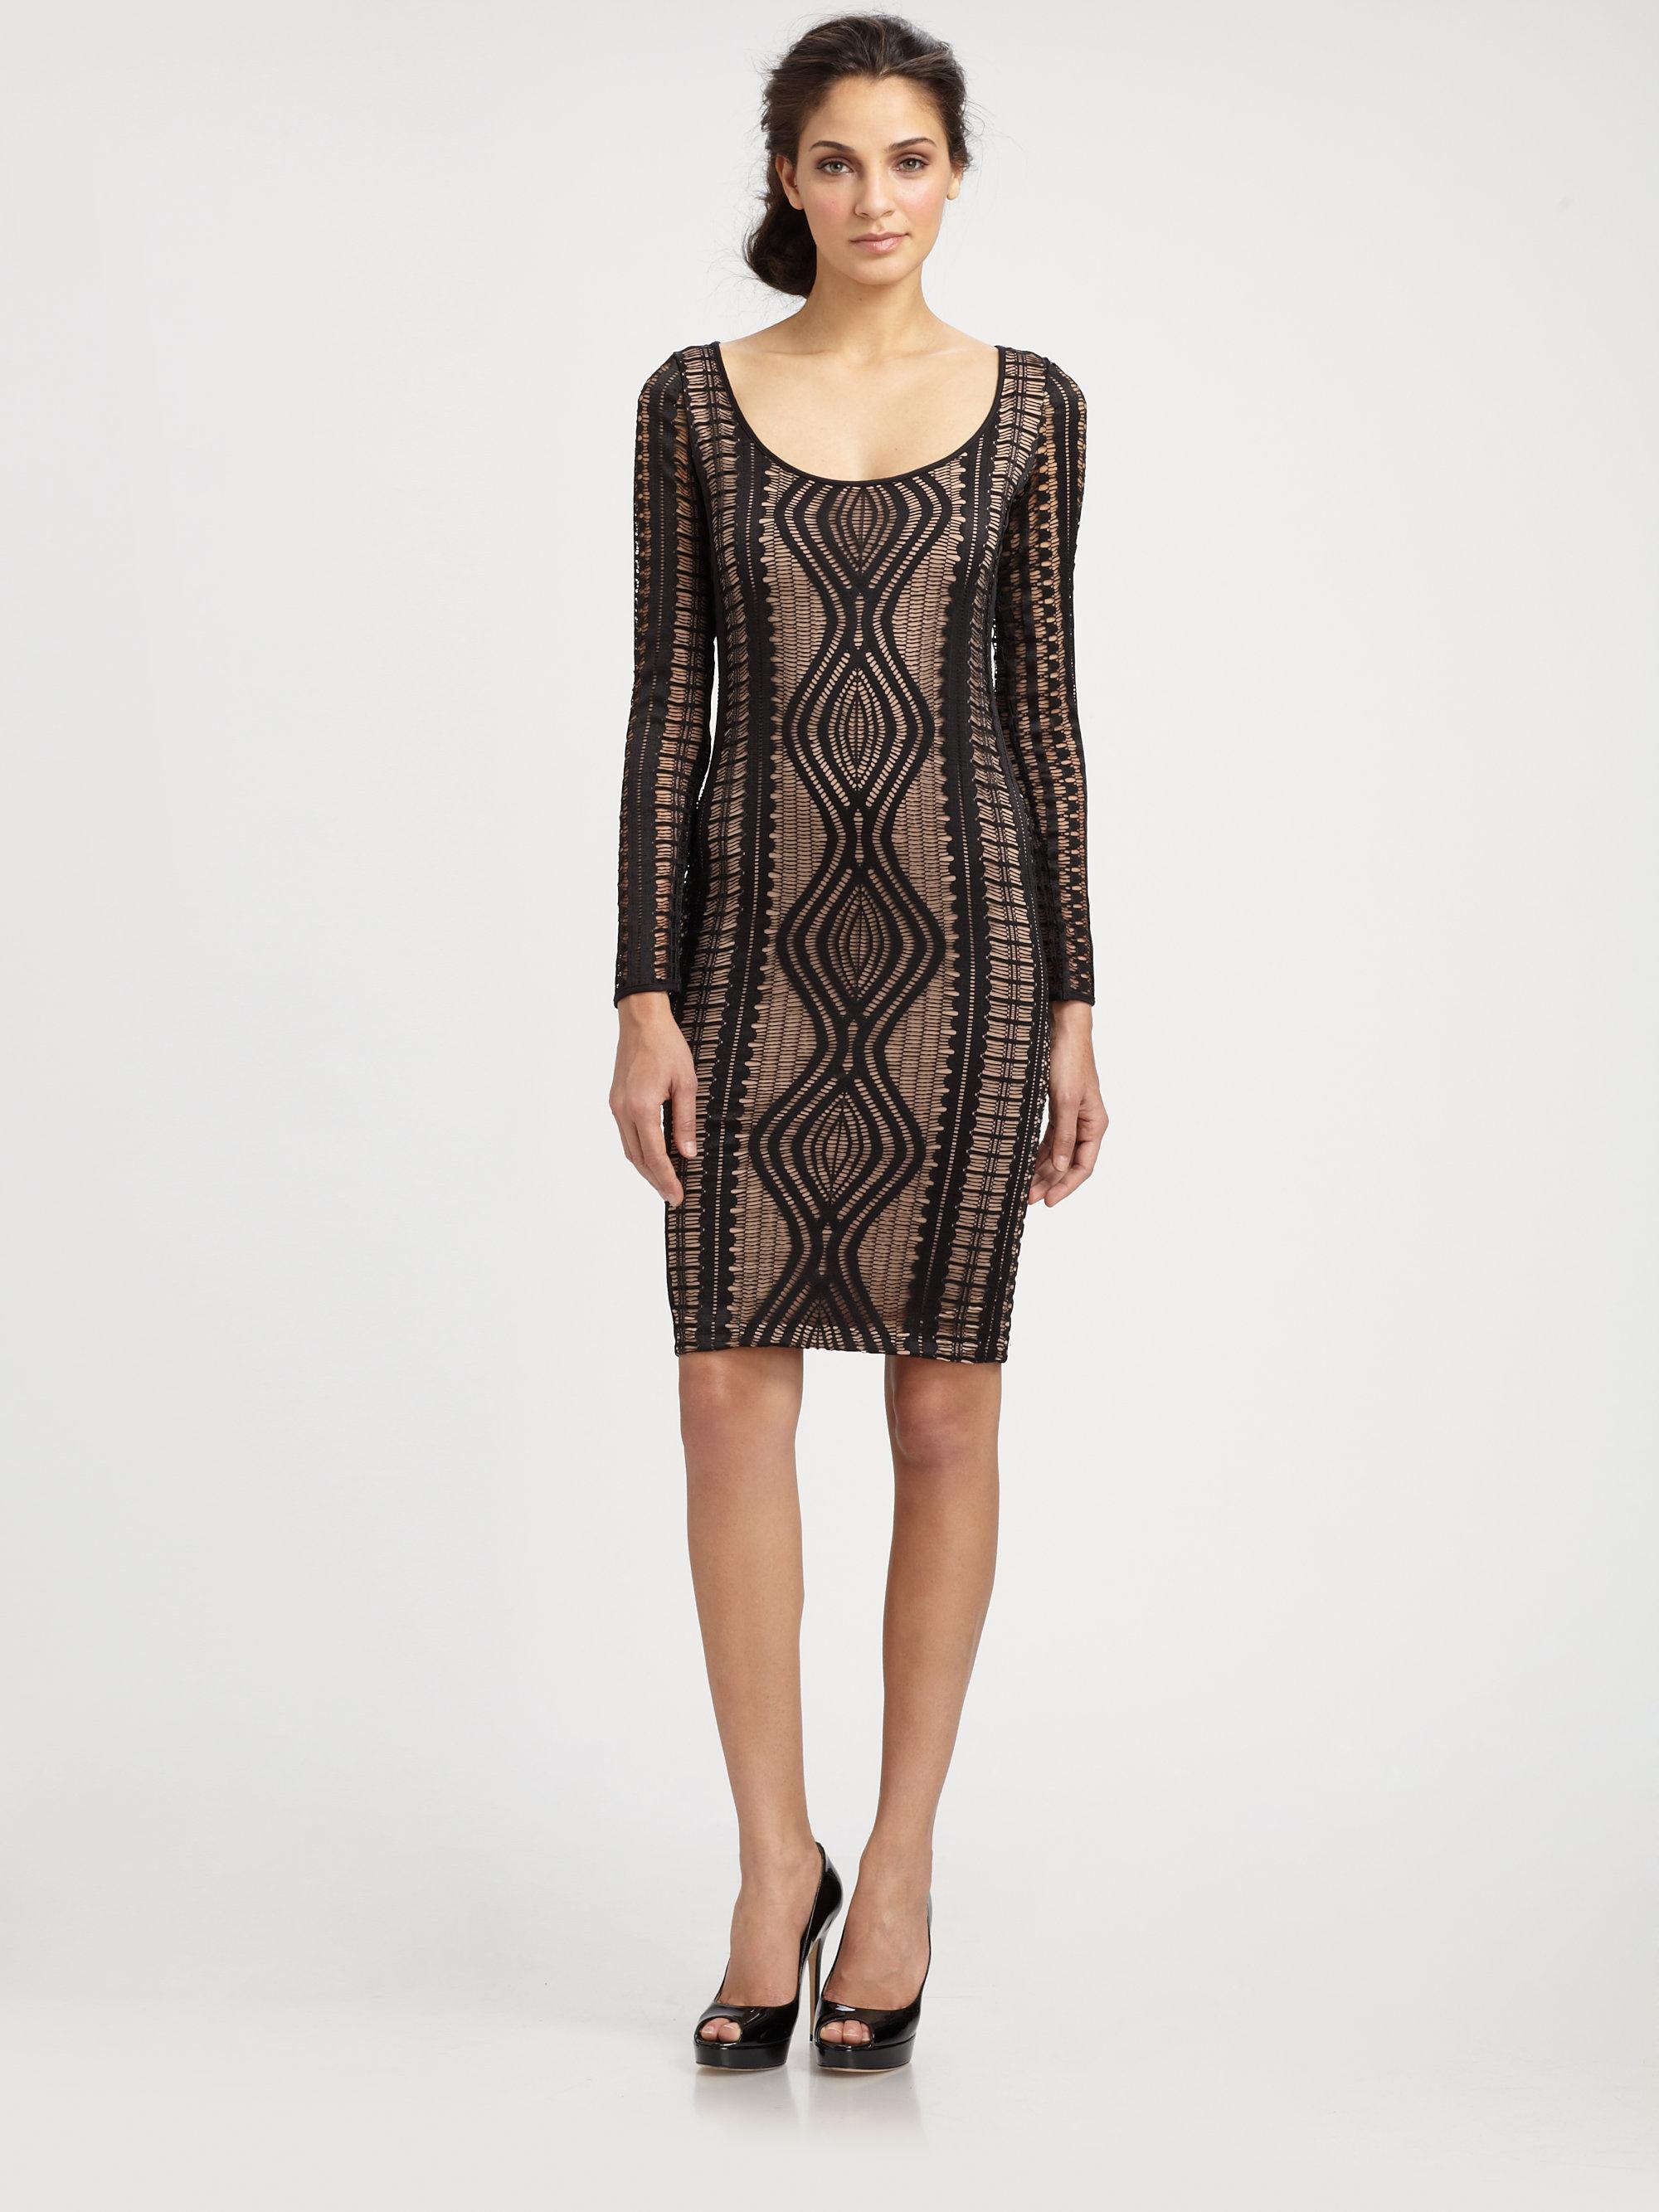 Bcbg long black lace dress